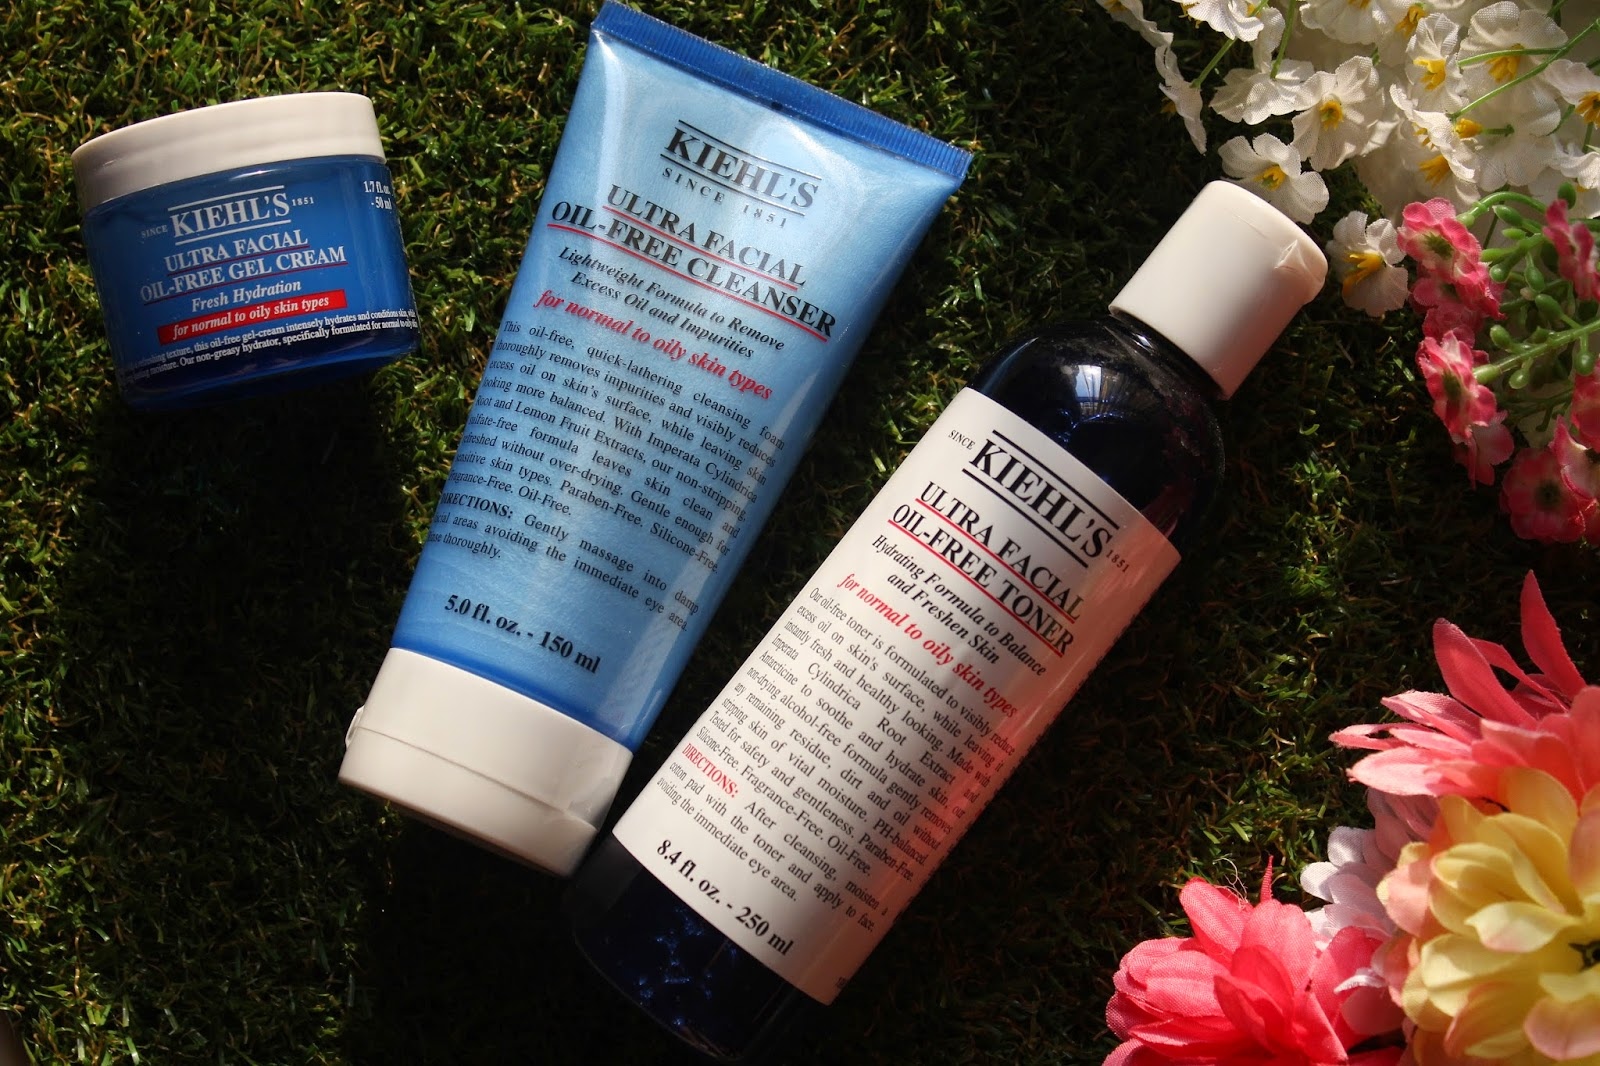 Kiehls Ultra Facial Oil Free Skincare Range For Oily Skin Regina Chow Cleanser 150ml